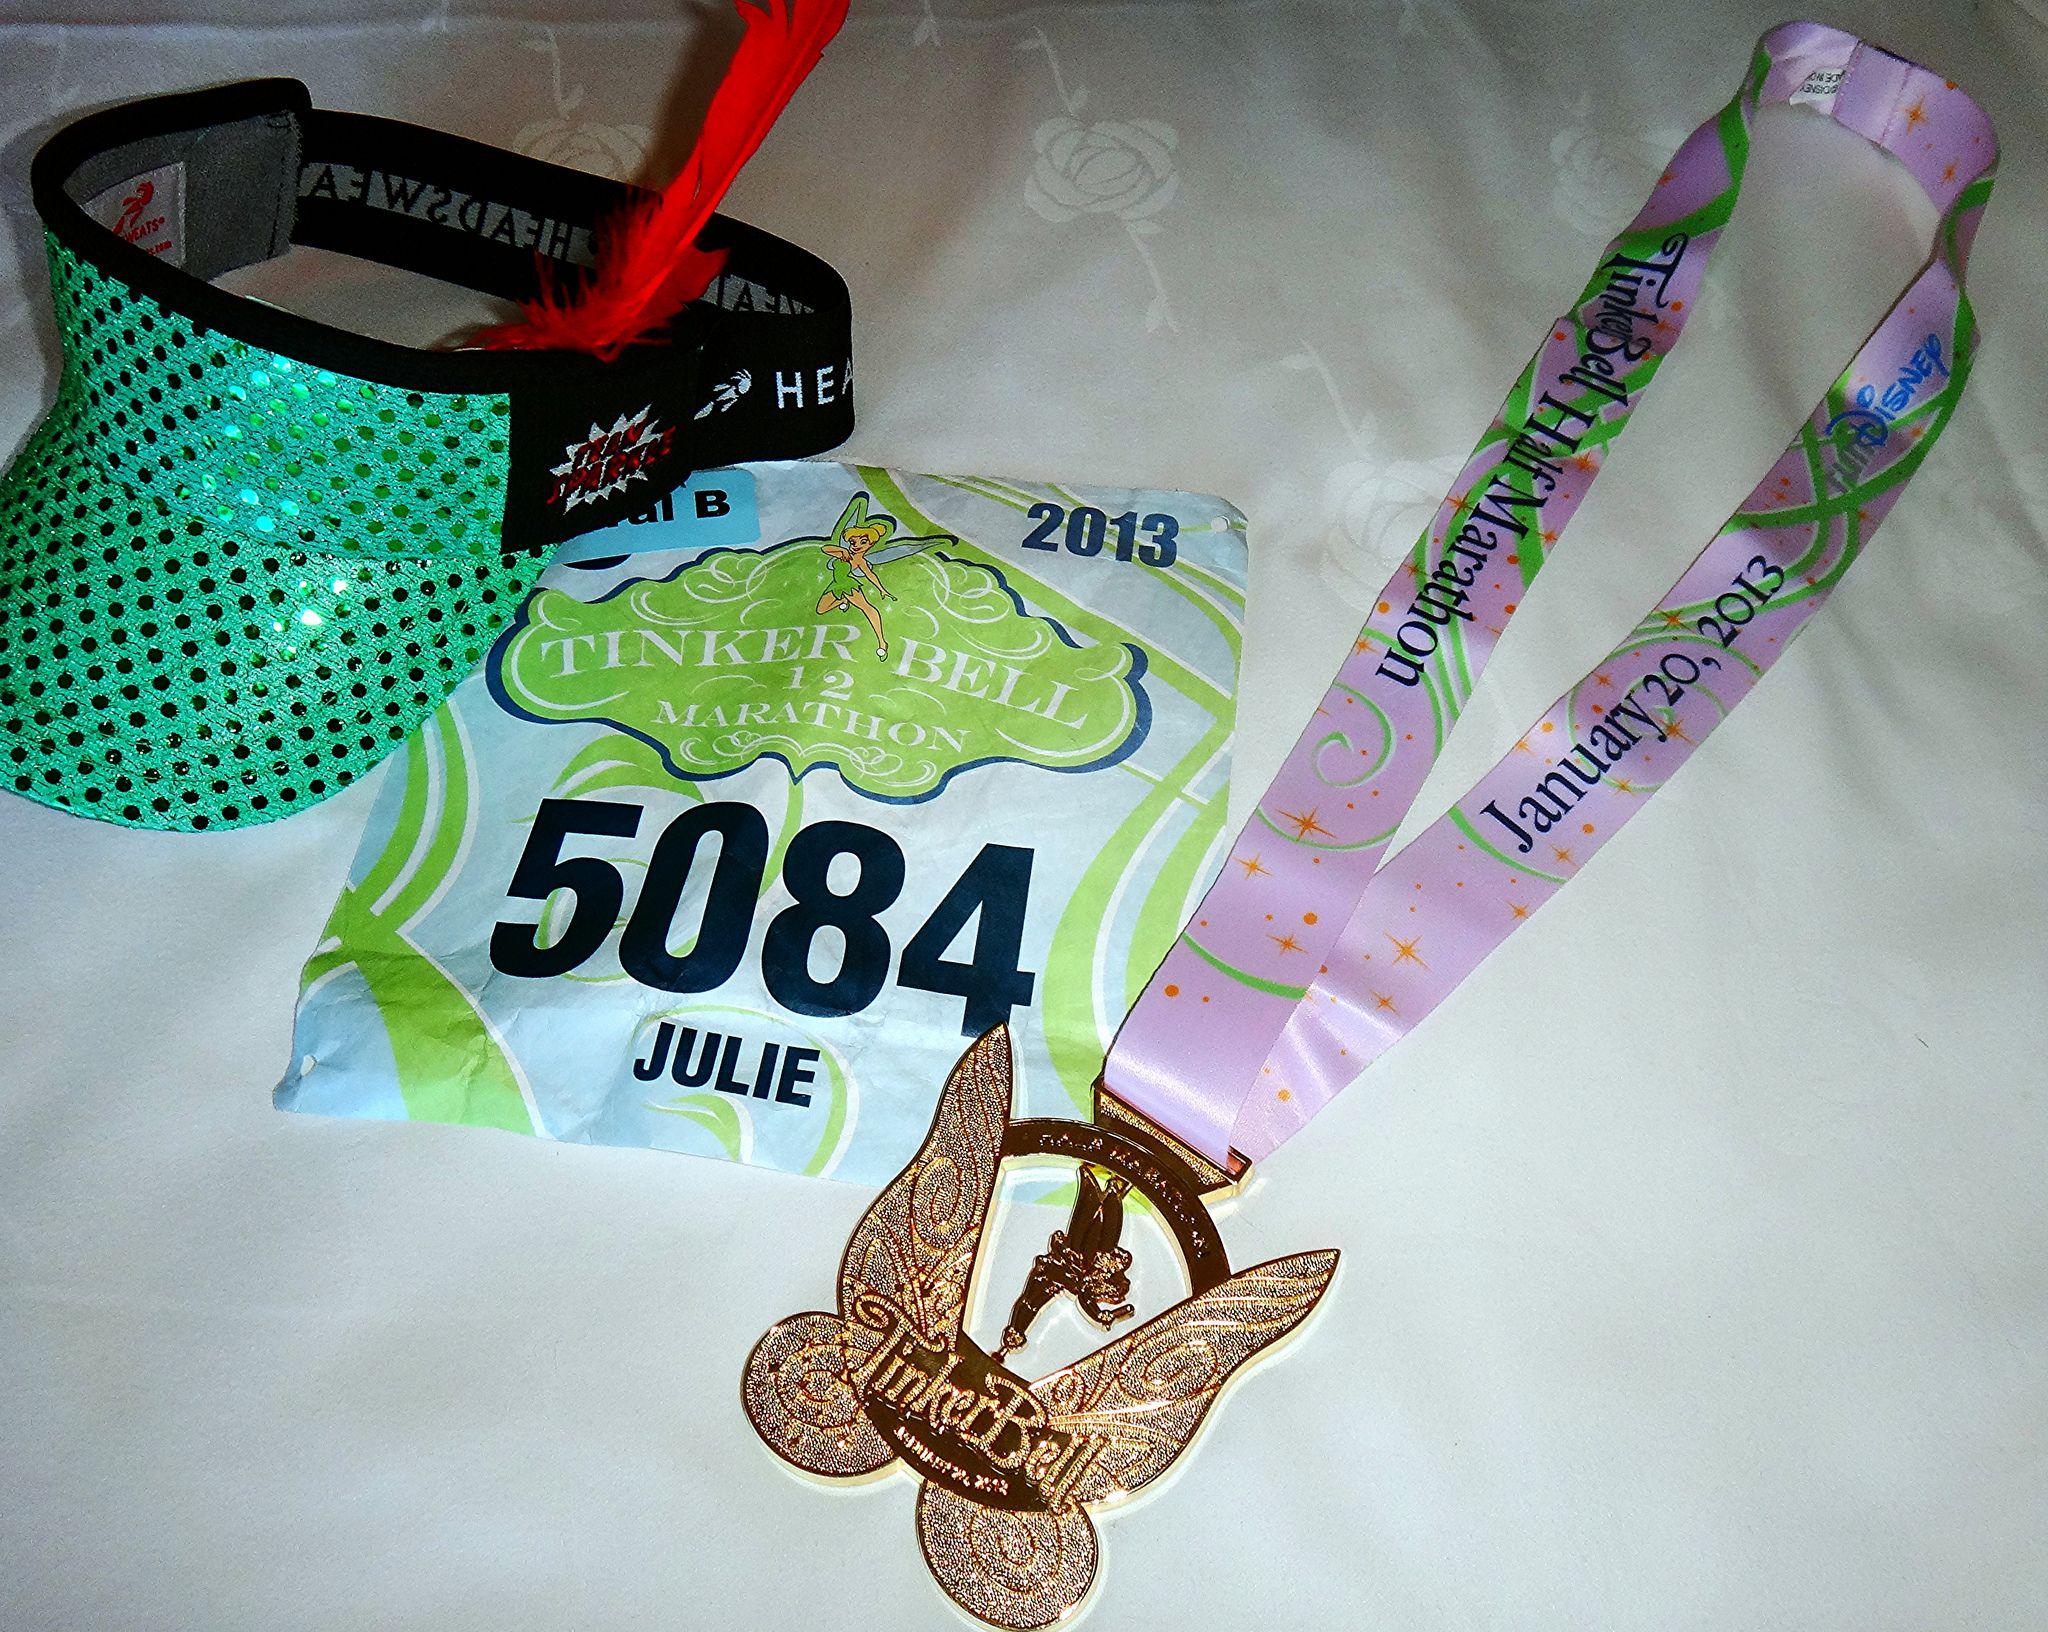 TinkerBell Half Marathon via AngryJulieMonday on Flickr